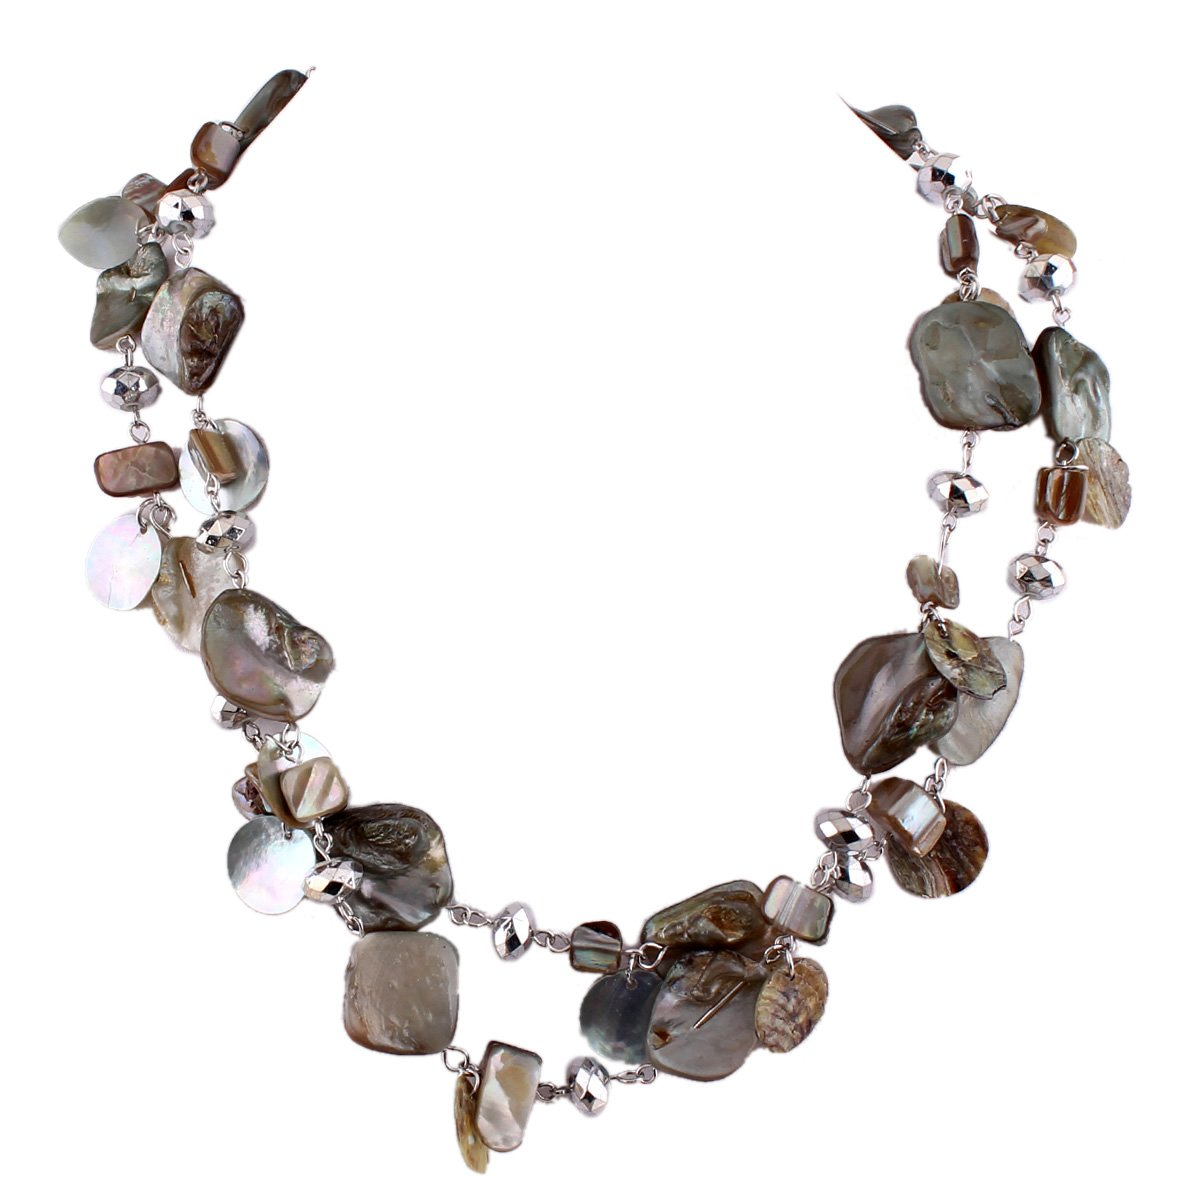 Grace Jun Handmade Natrual Shell Necklace for Women Statement Necklace Good Gift (36)